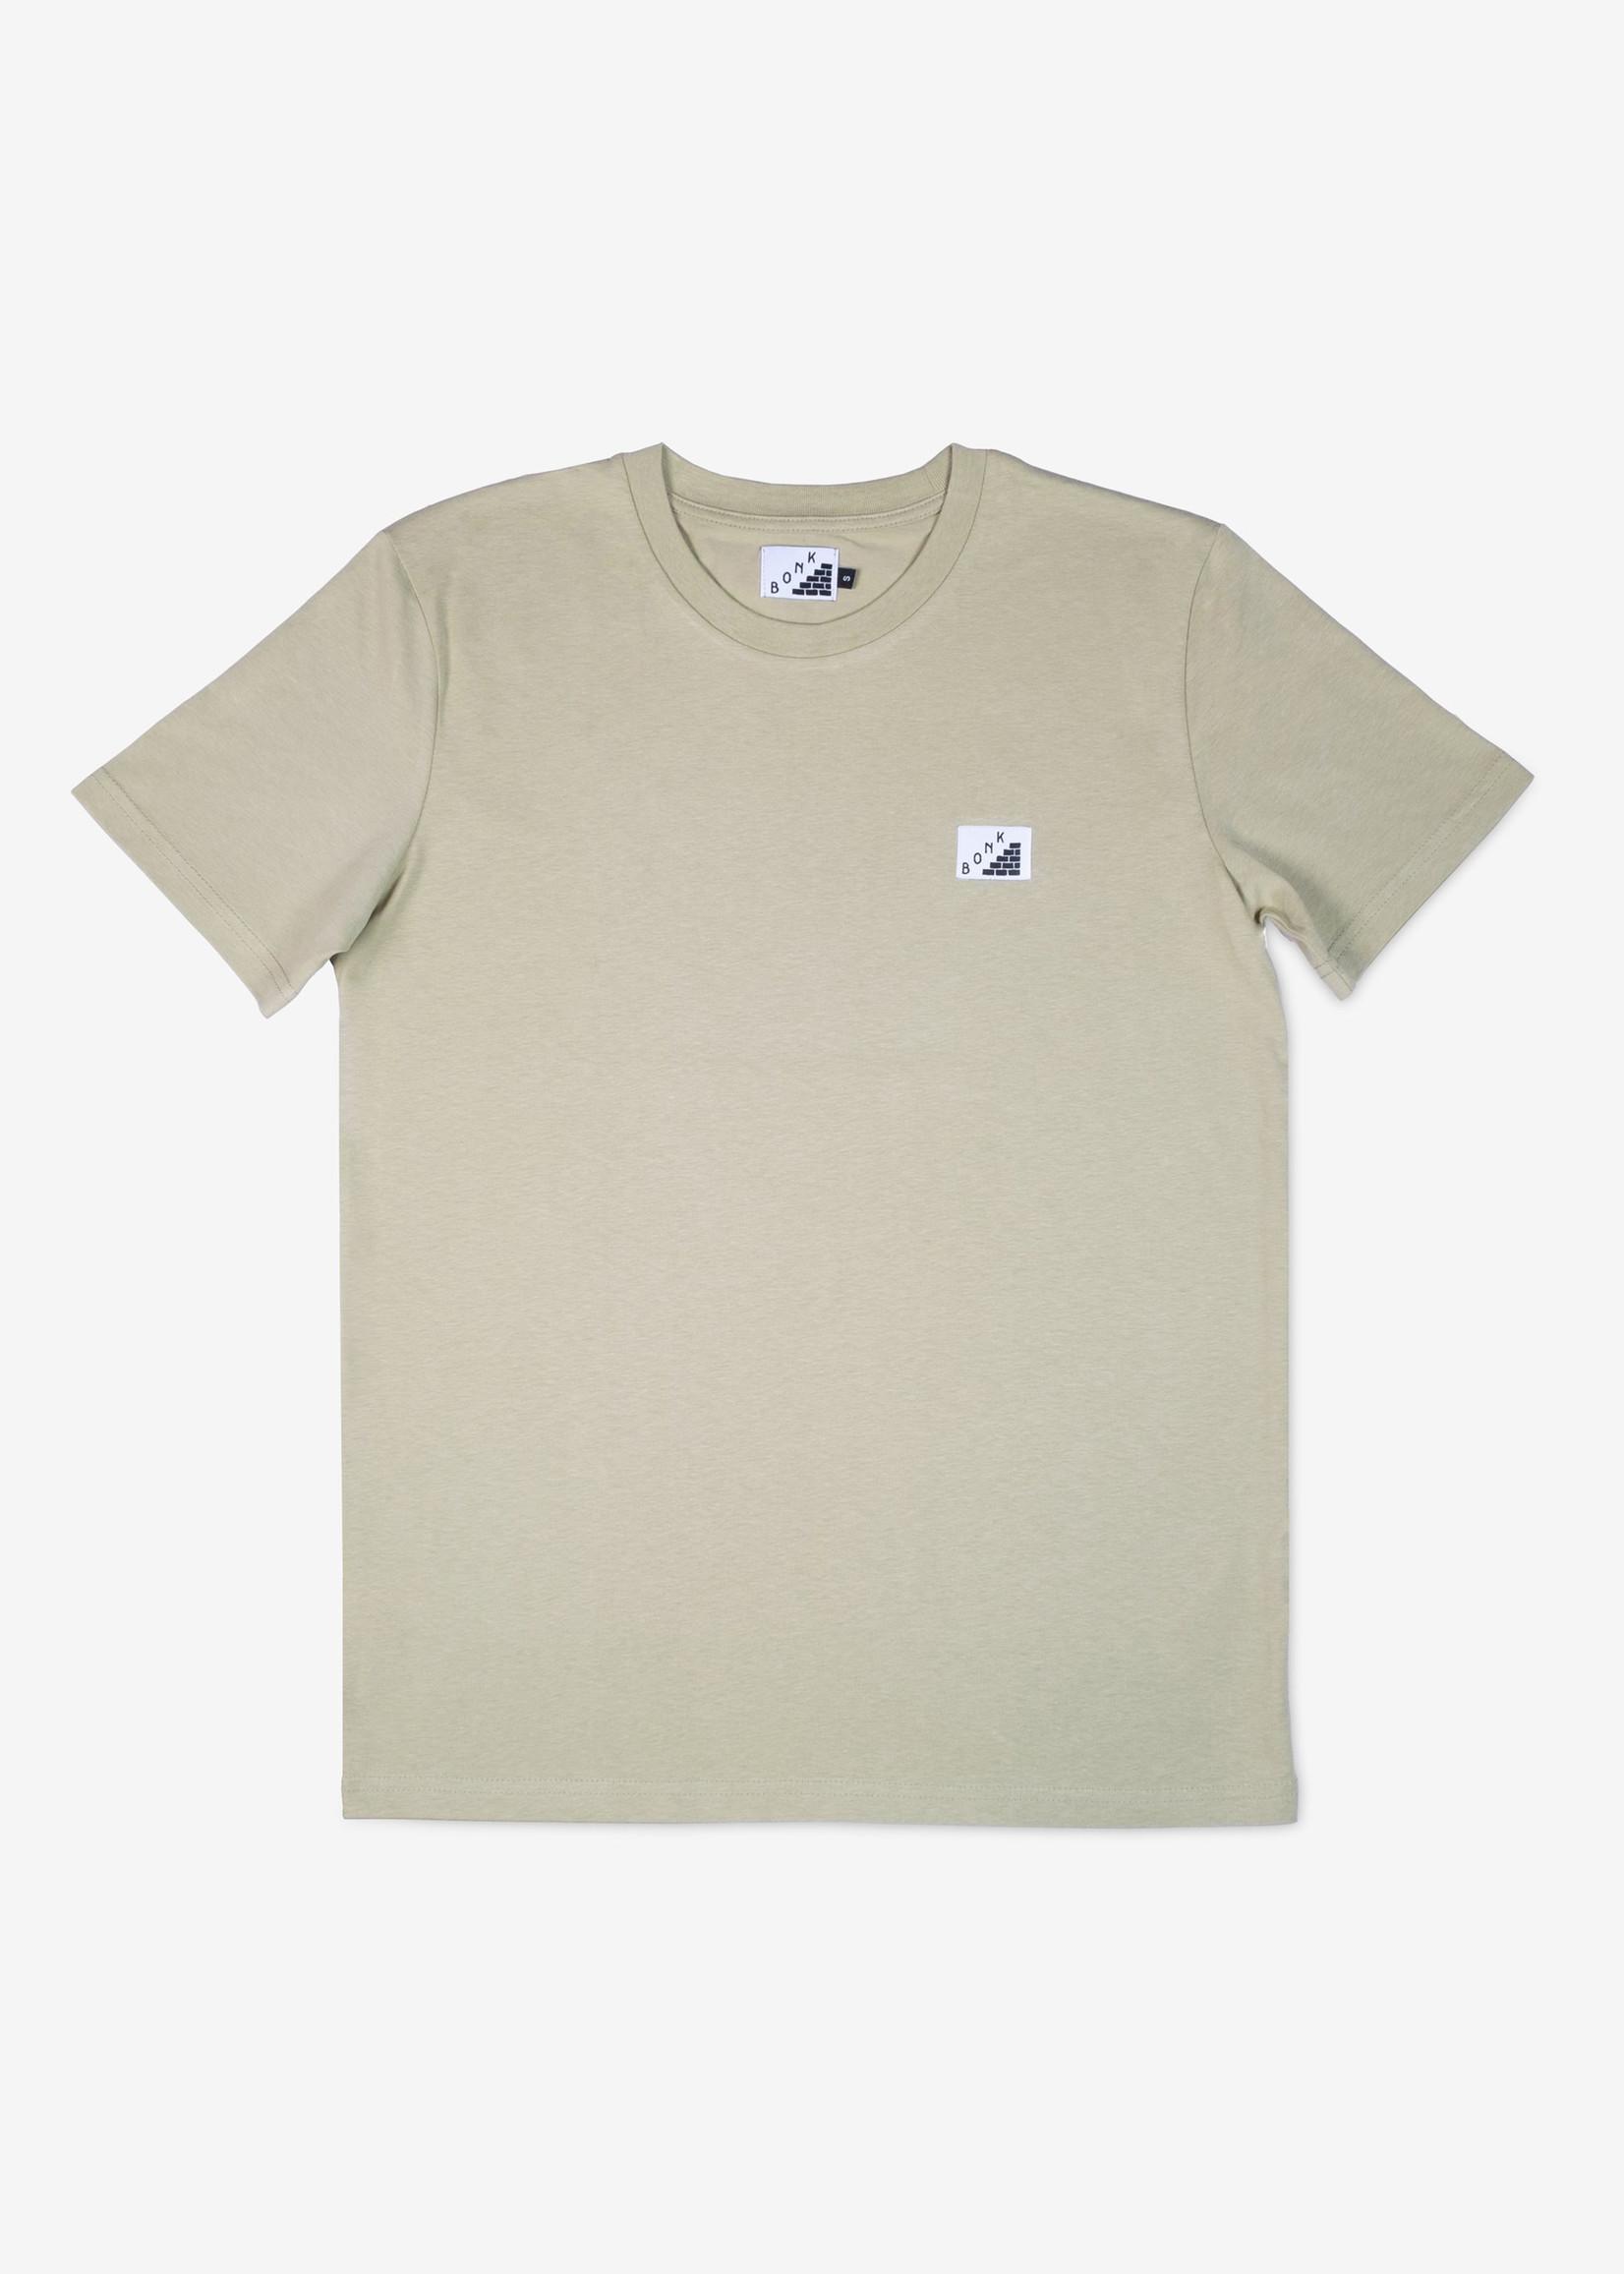 Bonk T-Shirt - Log Out - Olive